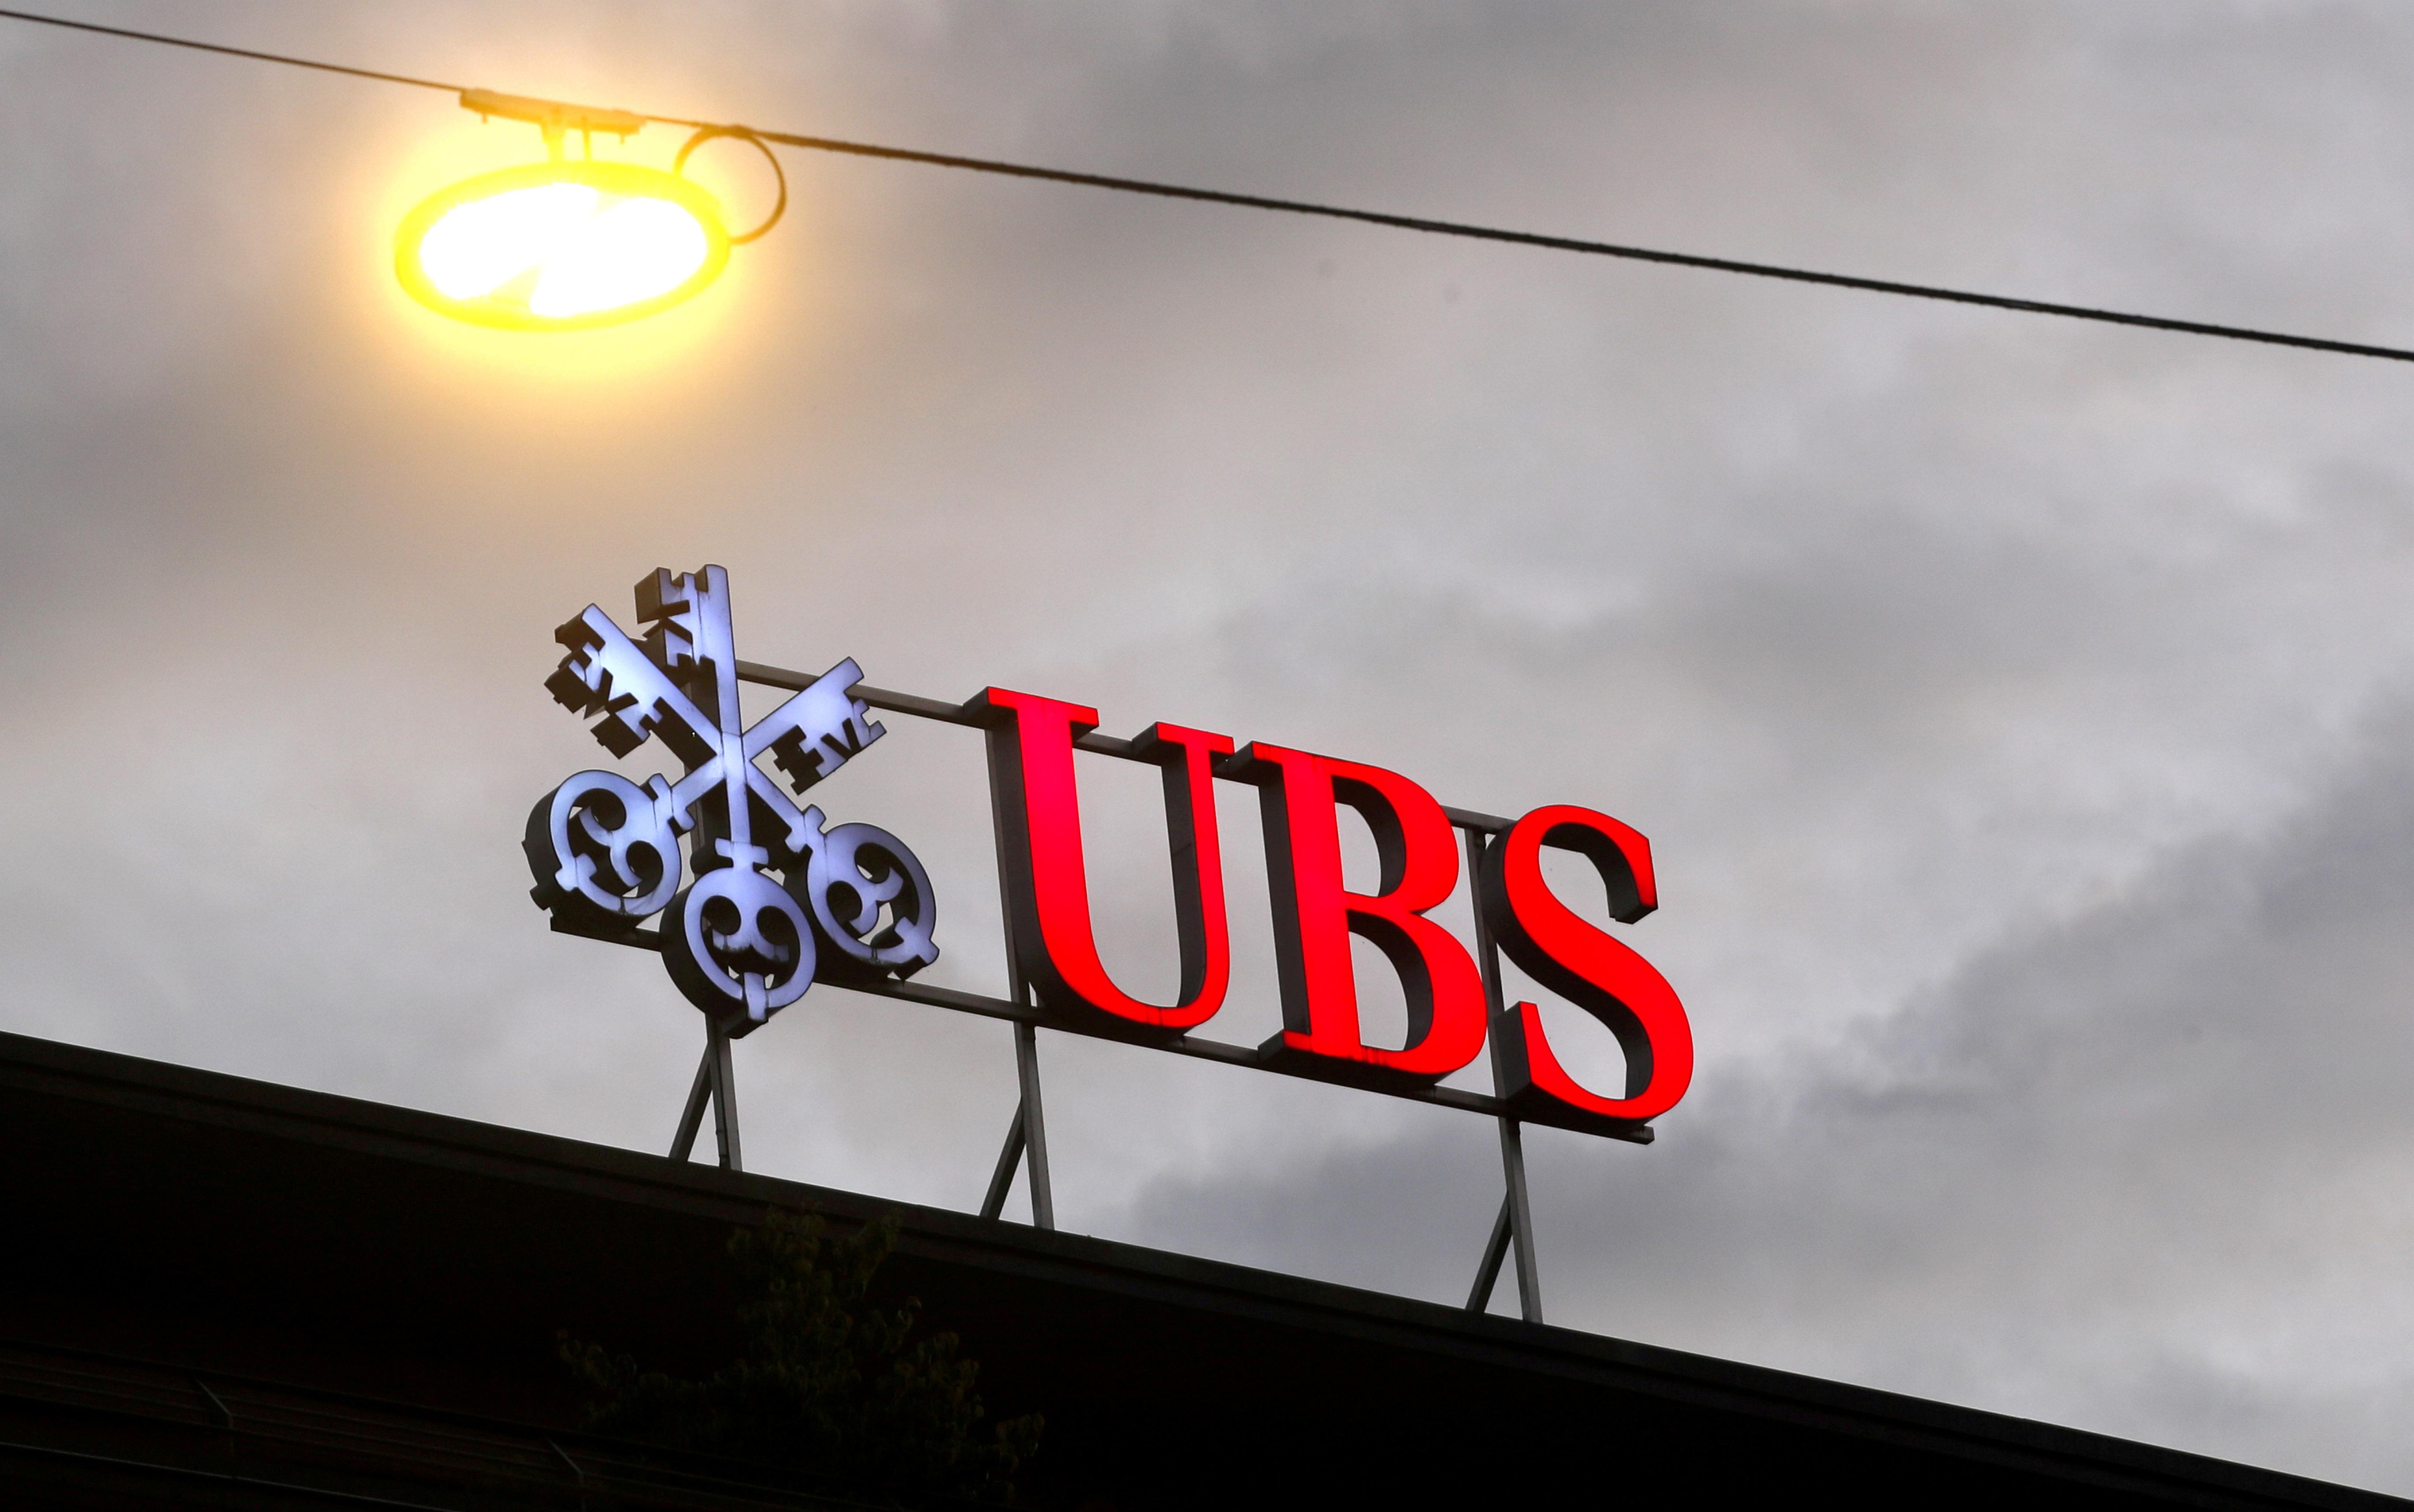 The logo of Swiss bank UBS is seen at a branch office in Zurich, Switzerland, June 22, 2020. REUTERS/Arnd Wiegmann